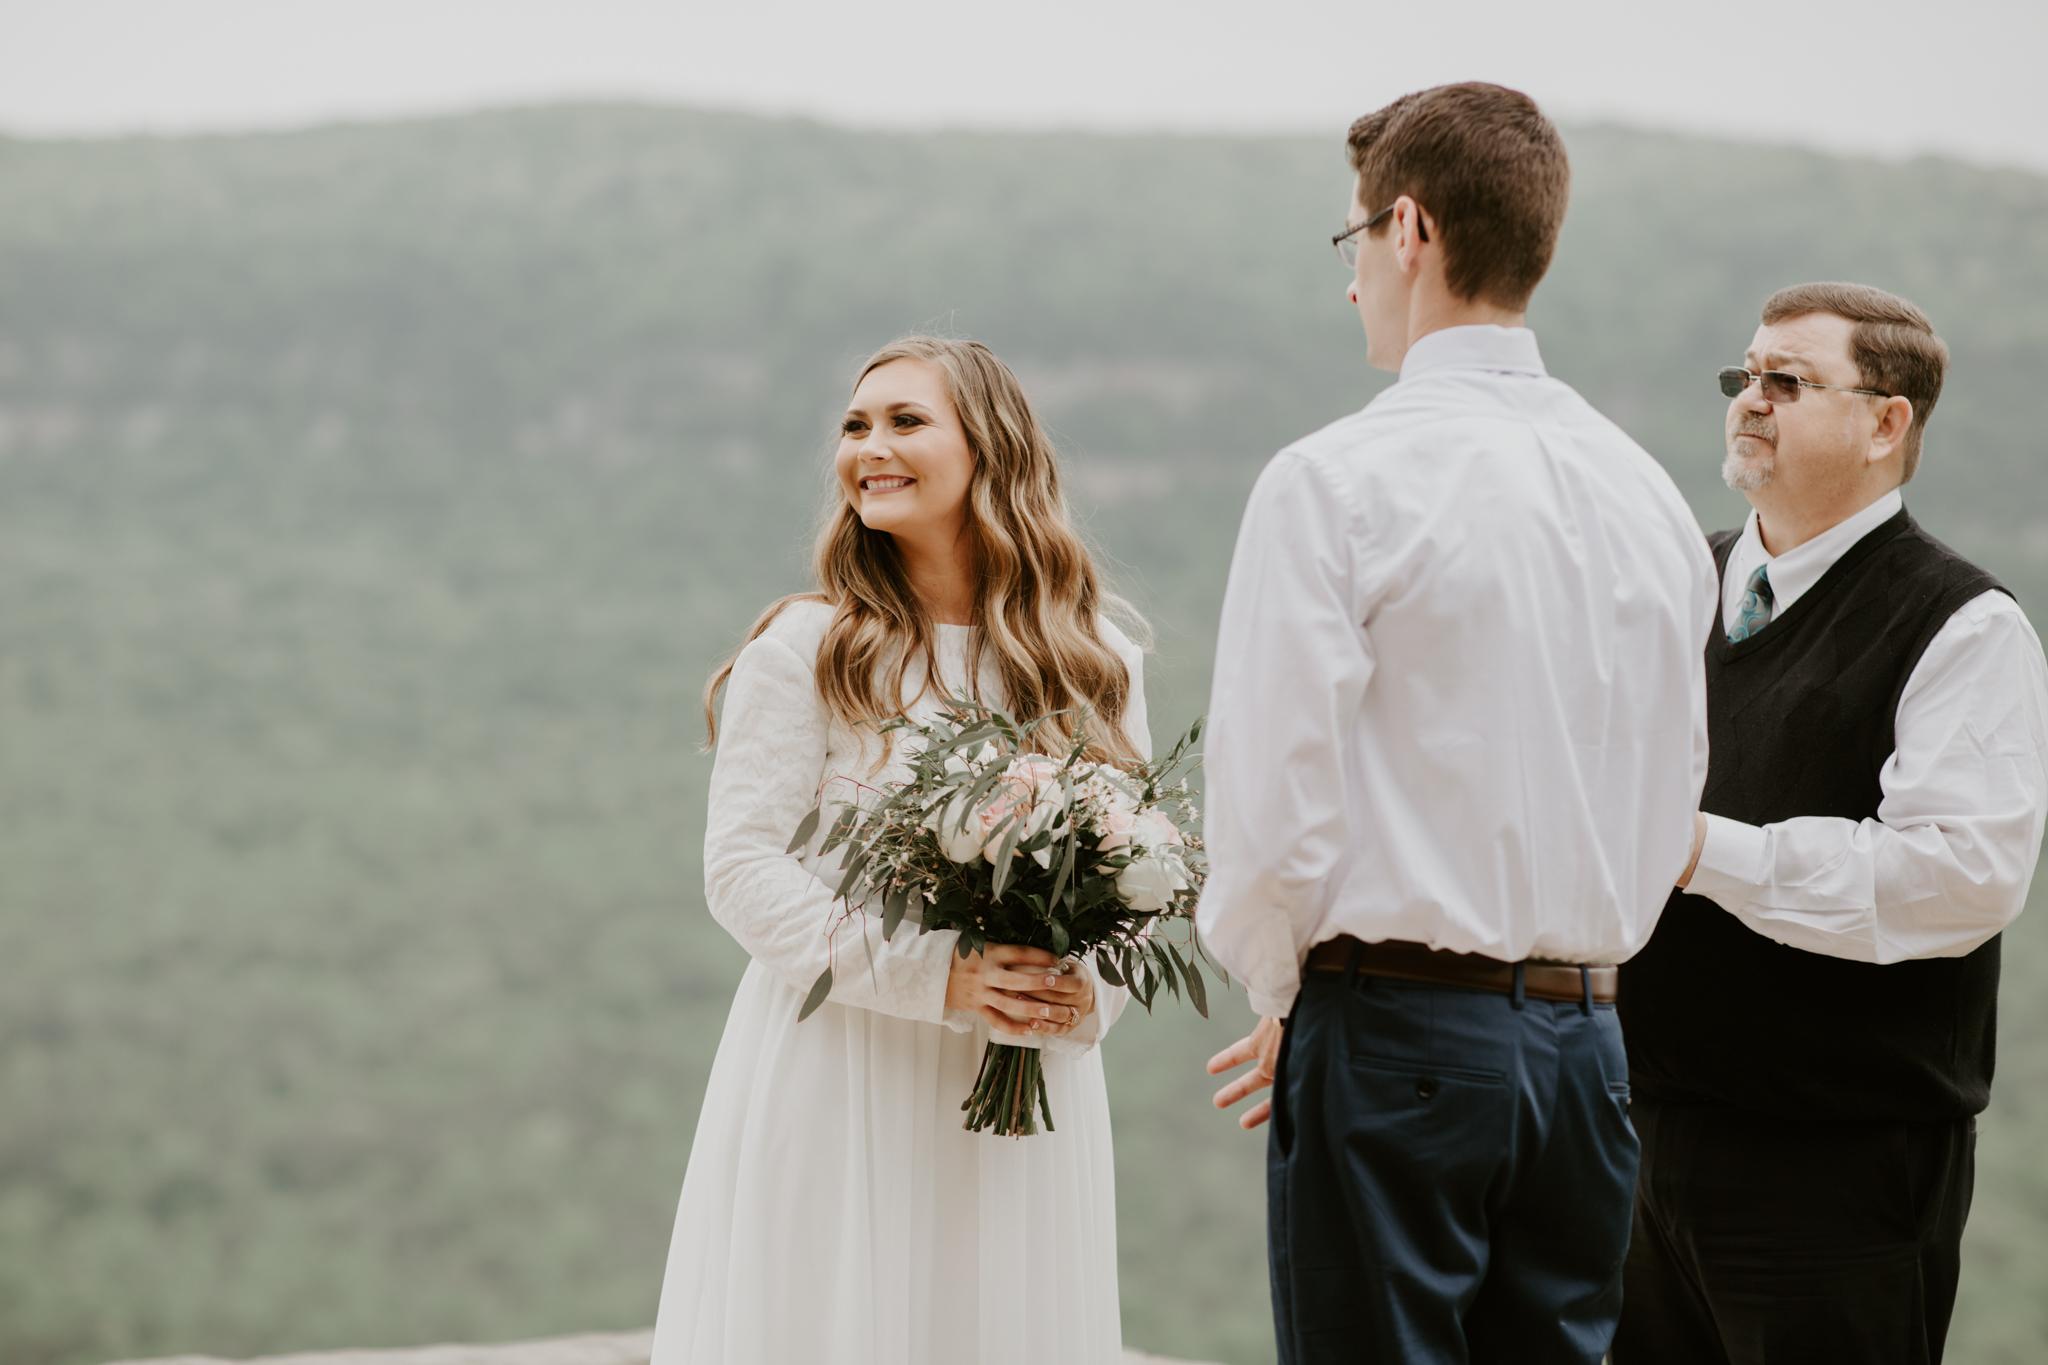 Lacey-Joe-Chattanooga-Nashville-Tennessee-Wedding-Elopement-Photographer-72.jpg